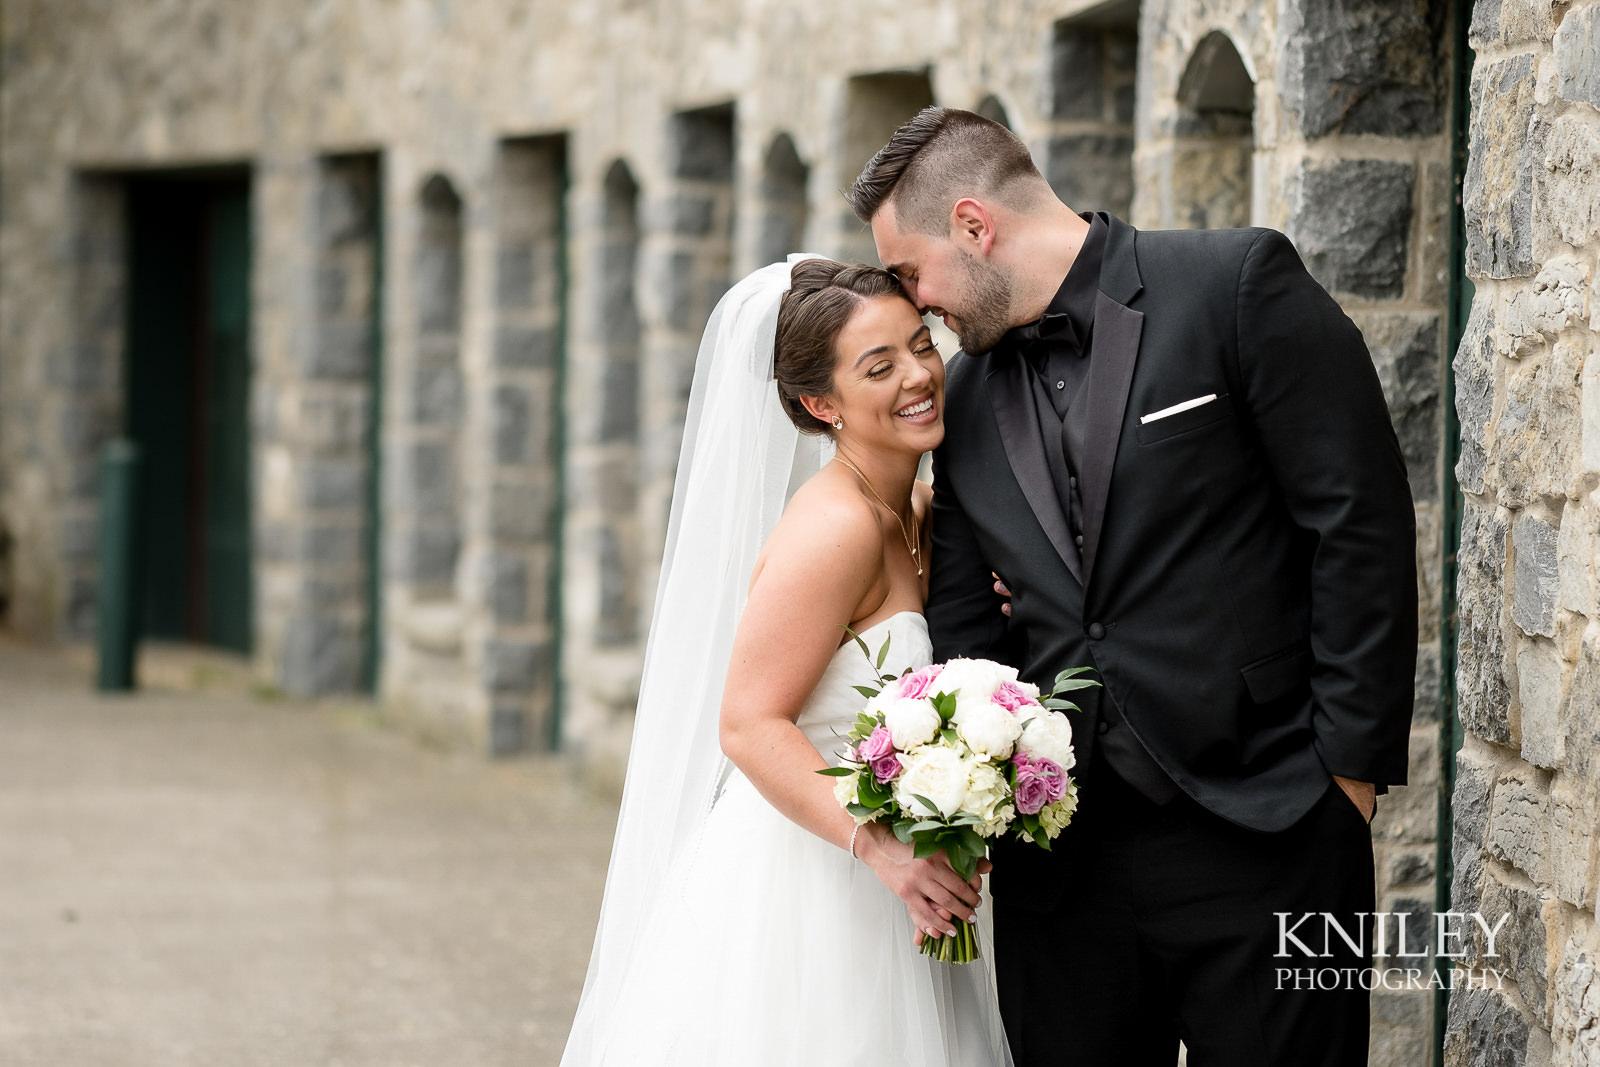 048 - Hoyt Lake Buffalo NY Wedding Pictures -XT2A7710.jpg